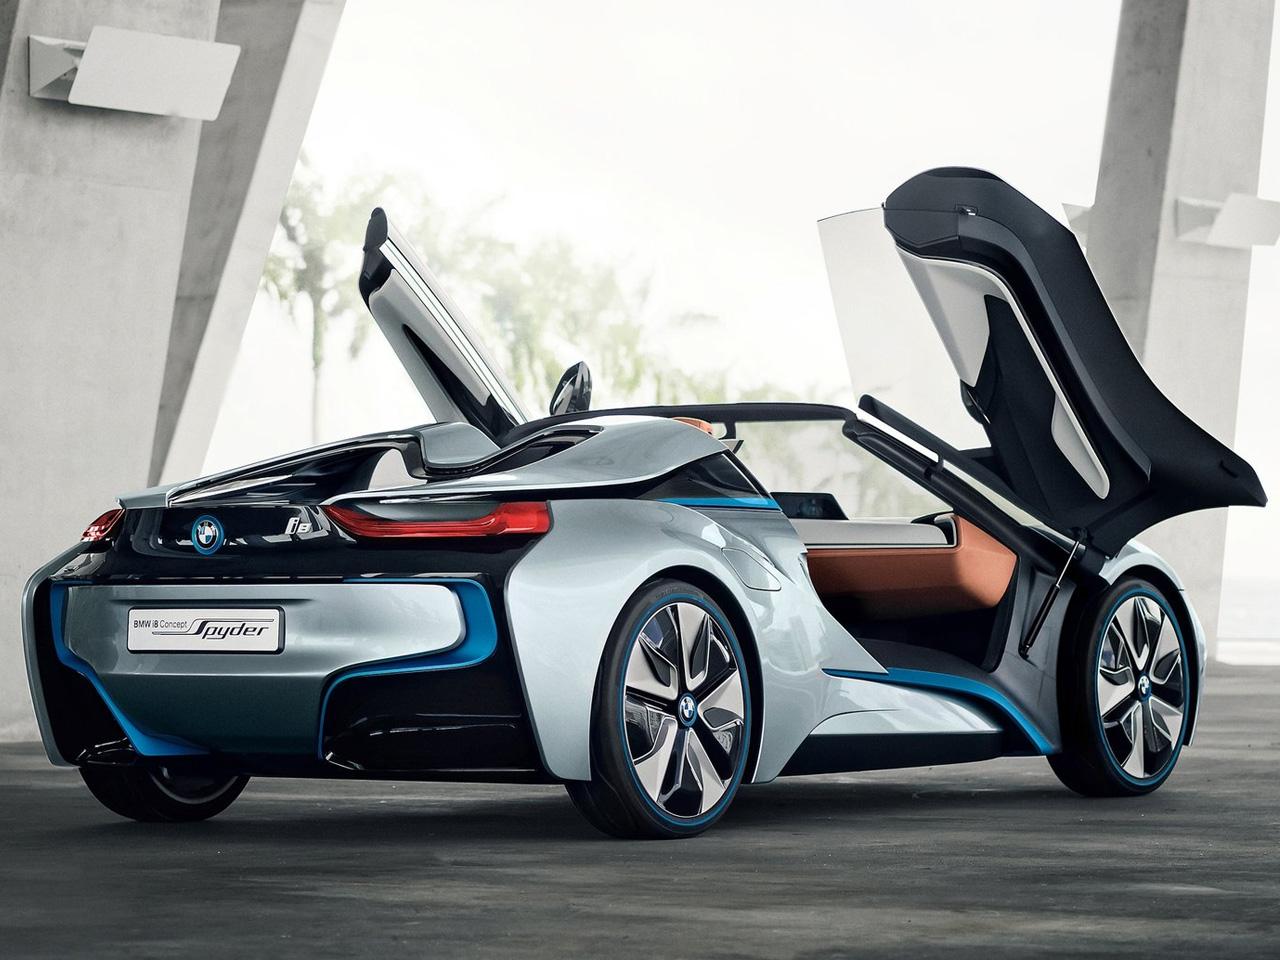 2012 BMW I8 Spyder Concept Rear Angle Door